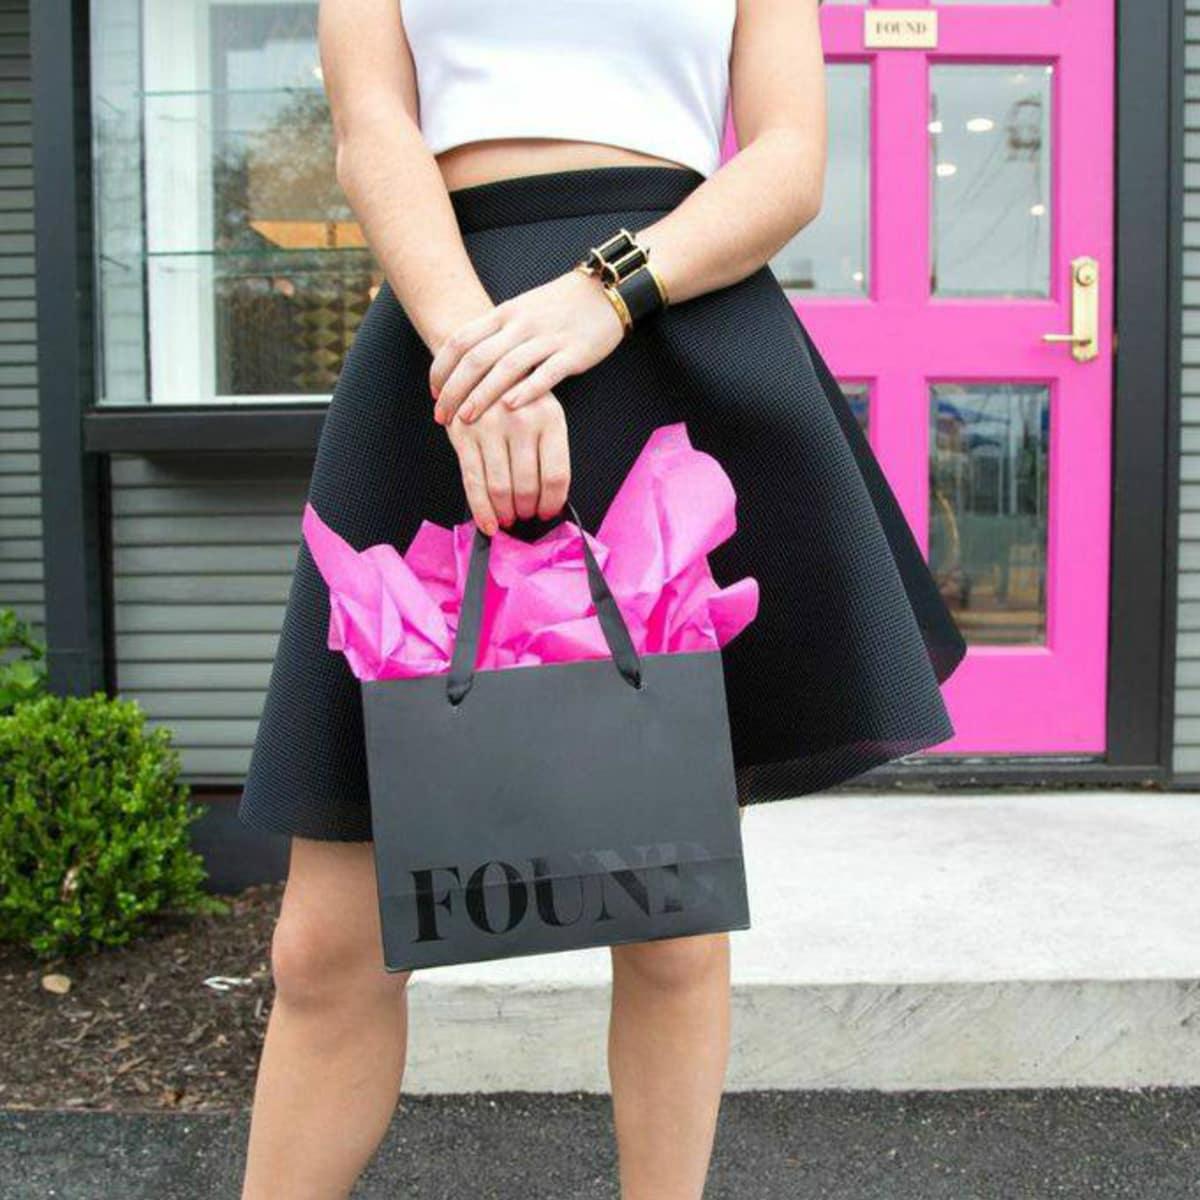 FOUND Austin store exterior pink door shopping bag 2015